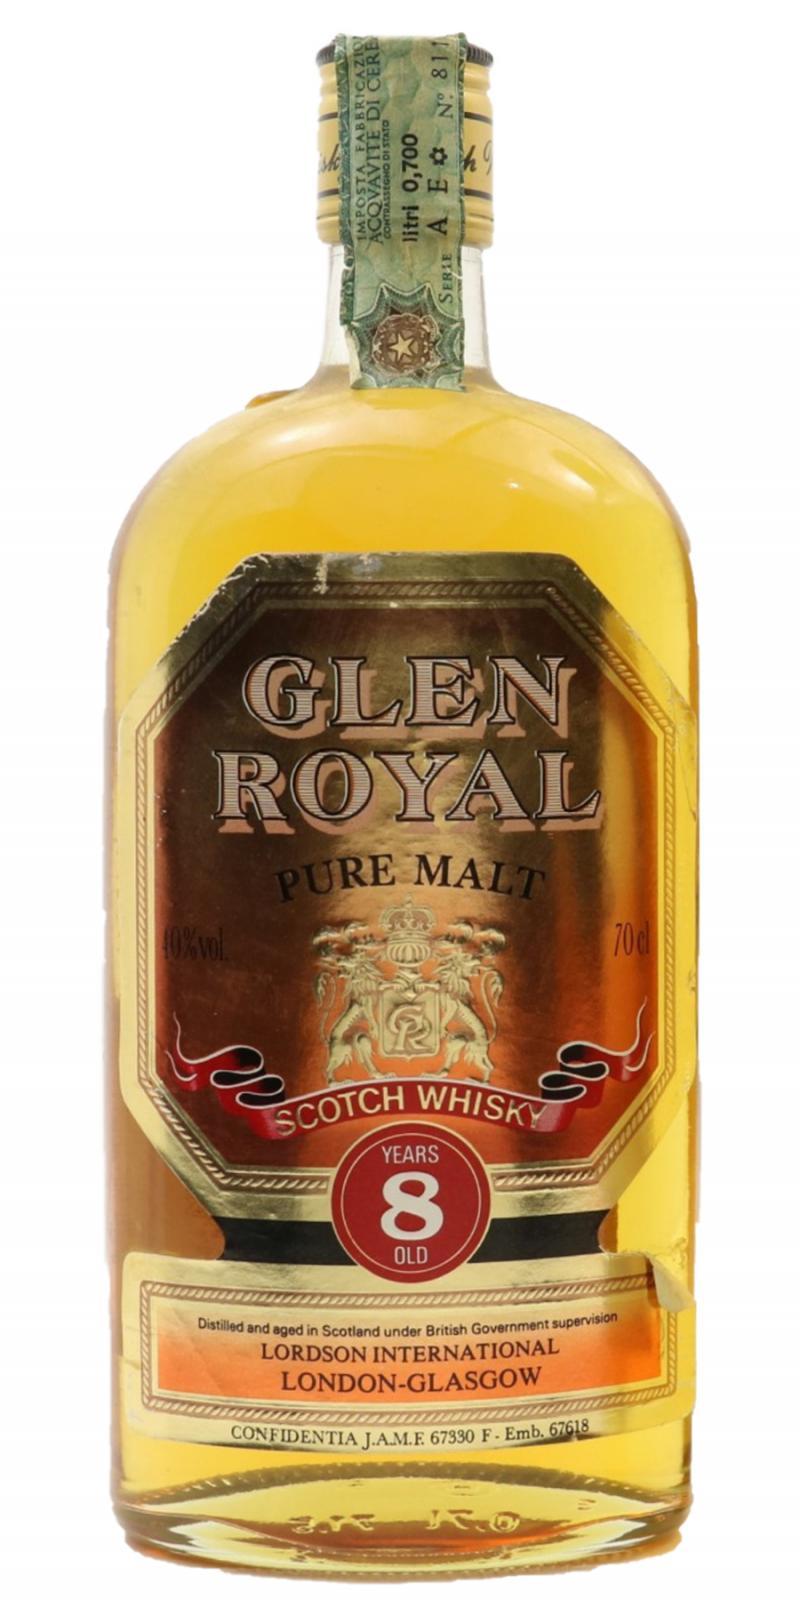 Glen Royal 08-year-old